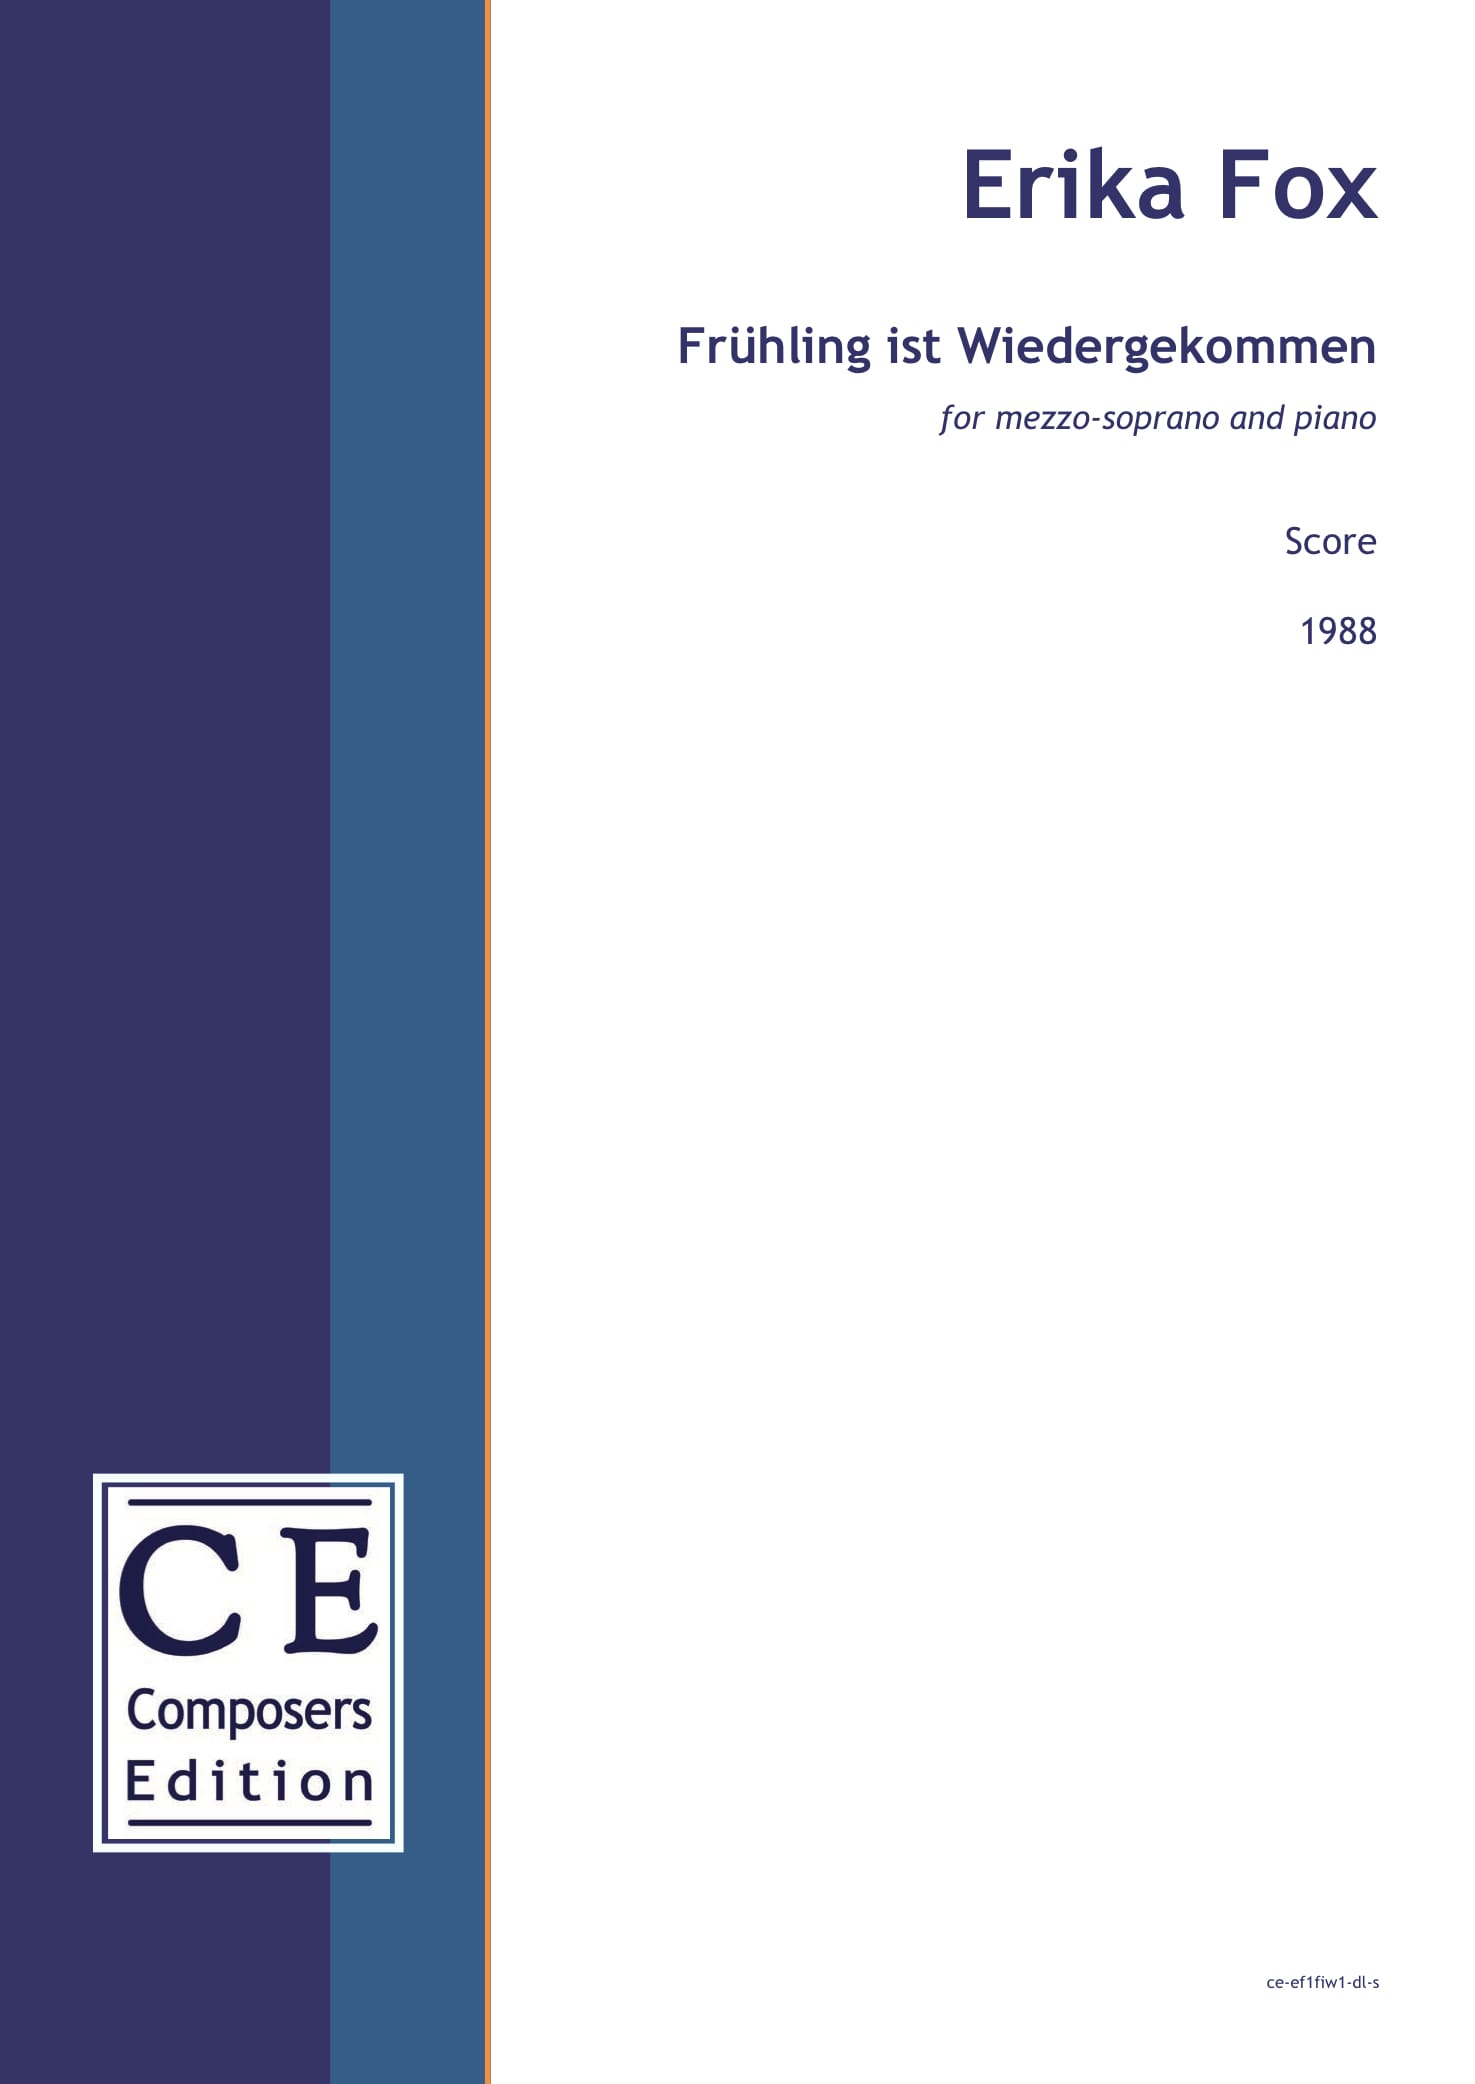 Erika Fox: Frühling ist Wiedergekommen for mezzo-soprano and piano